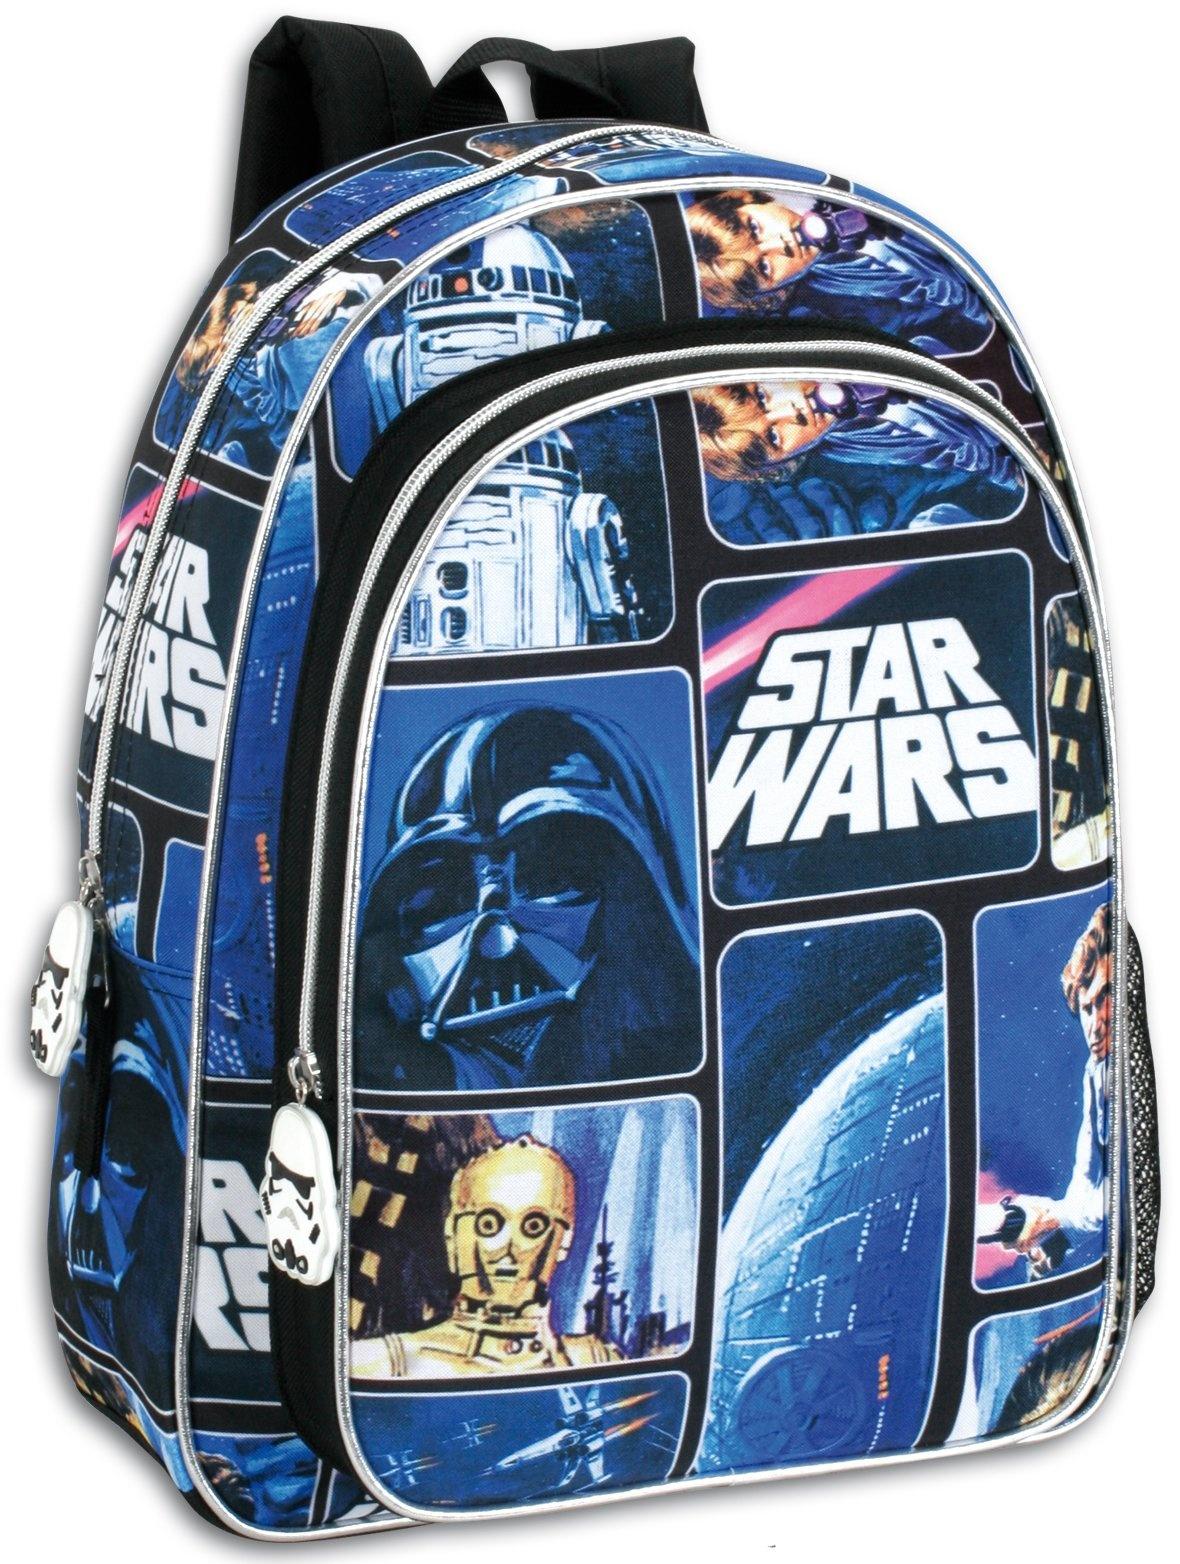 e2be07c576 Τσάντα με πλαινή θηκη Star wars 37 29 11